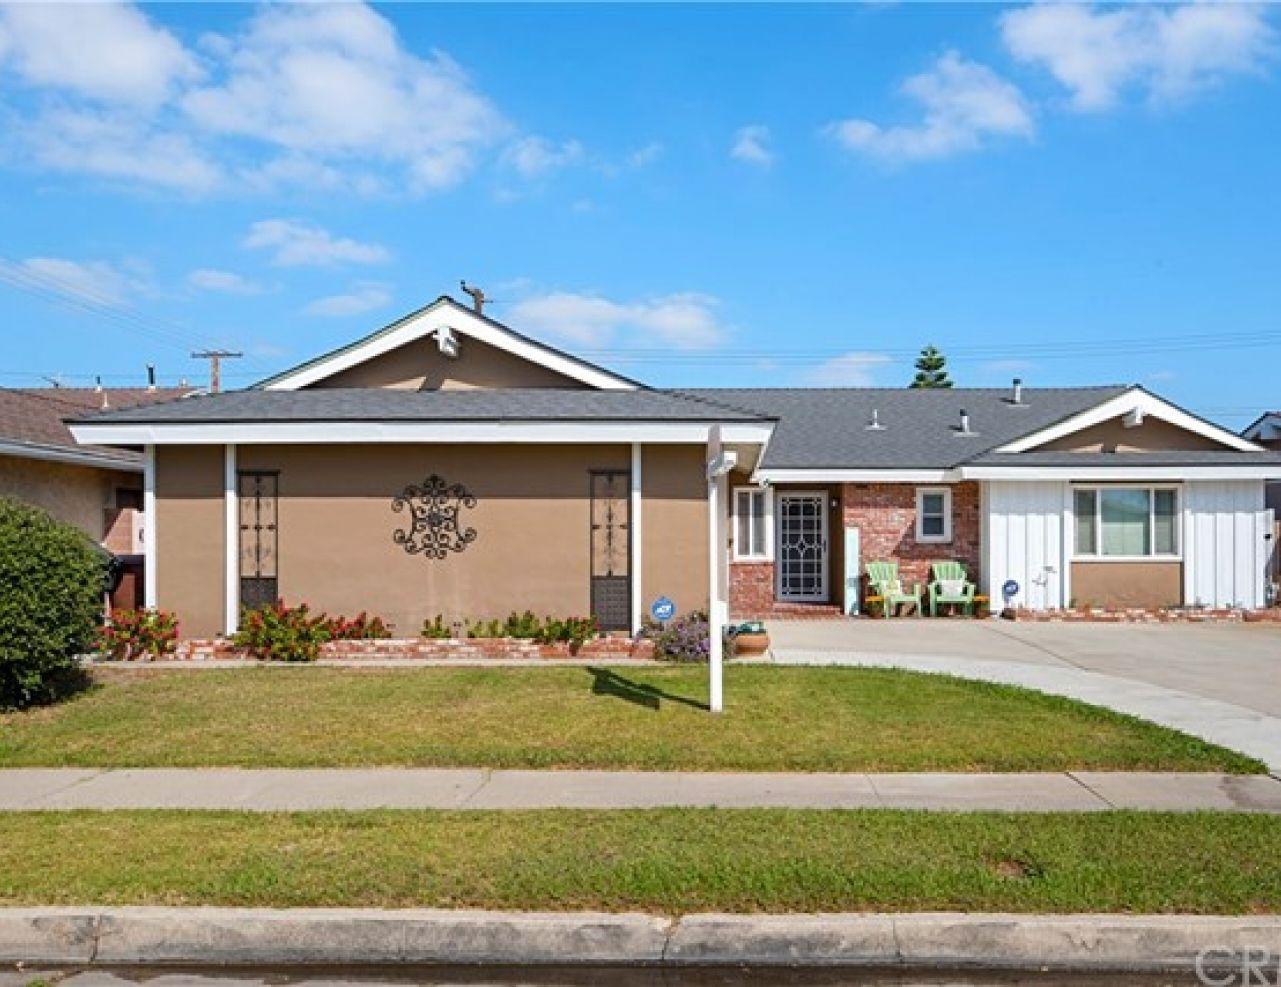 6521 Stanford Avenue, Garden Grove, CA 92845 Garden